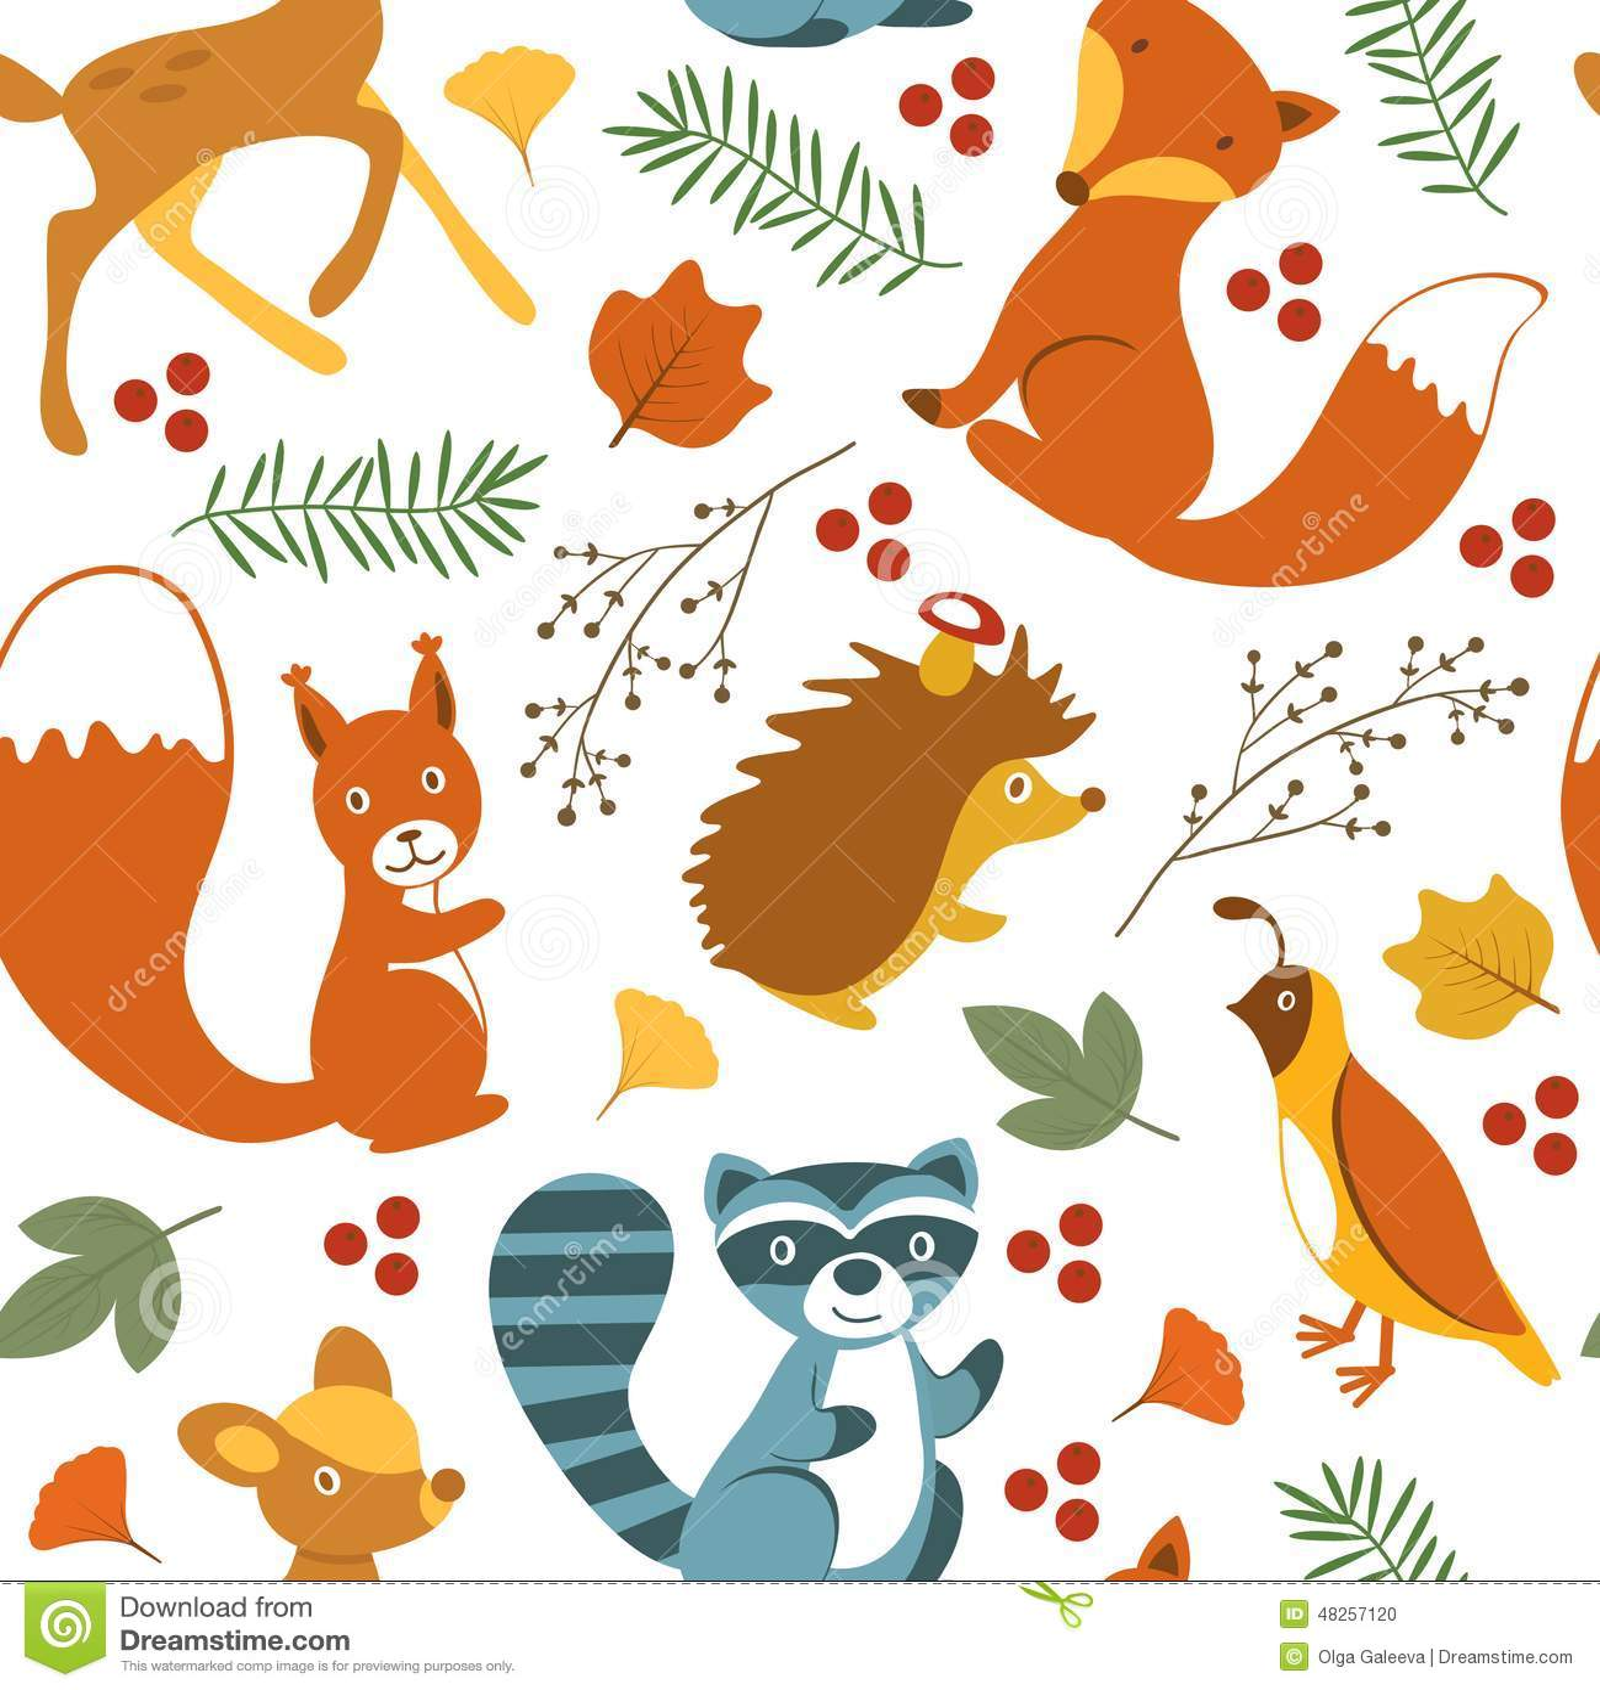 Fall Woodland Creatures Wallpaper Cute Woodland Animals Pattern Stock Vector Illustration